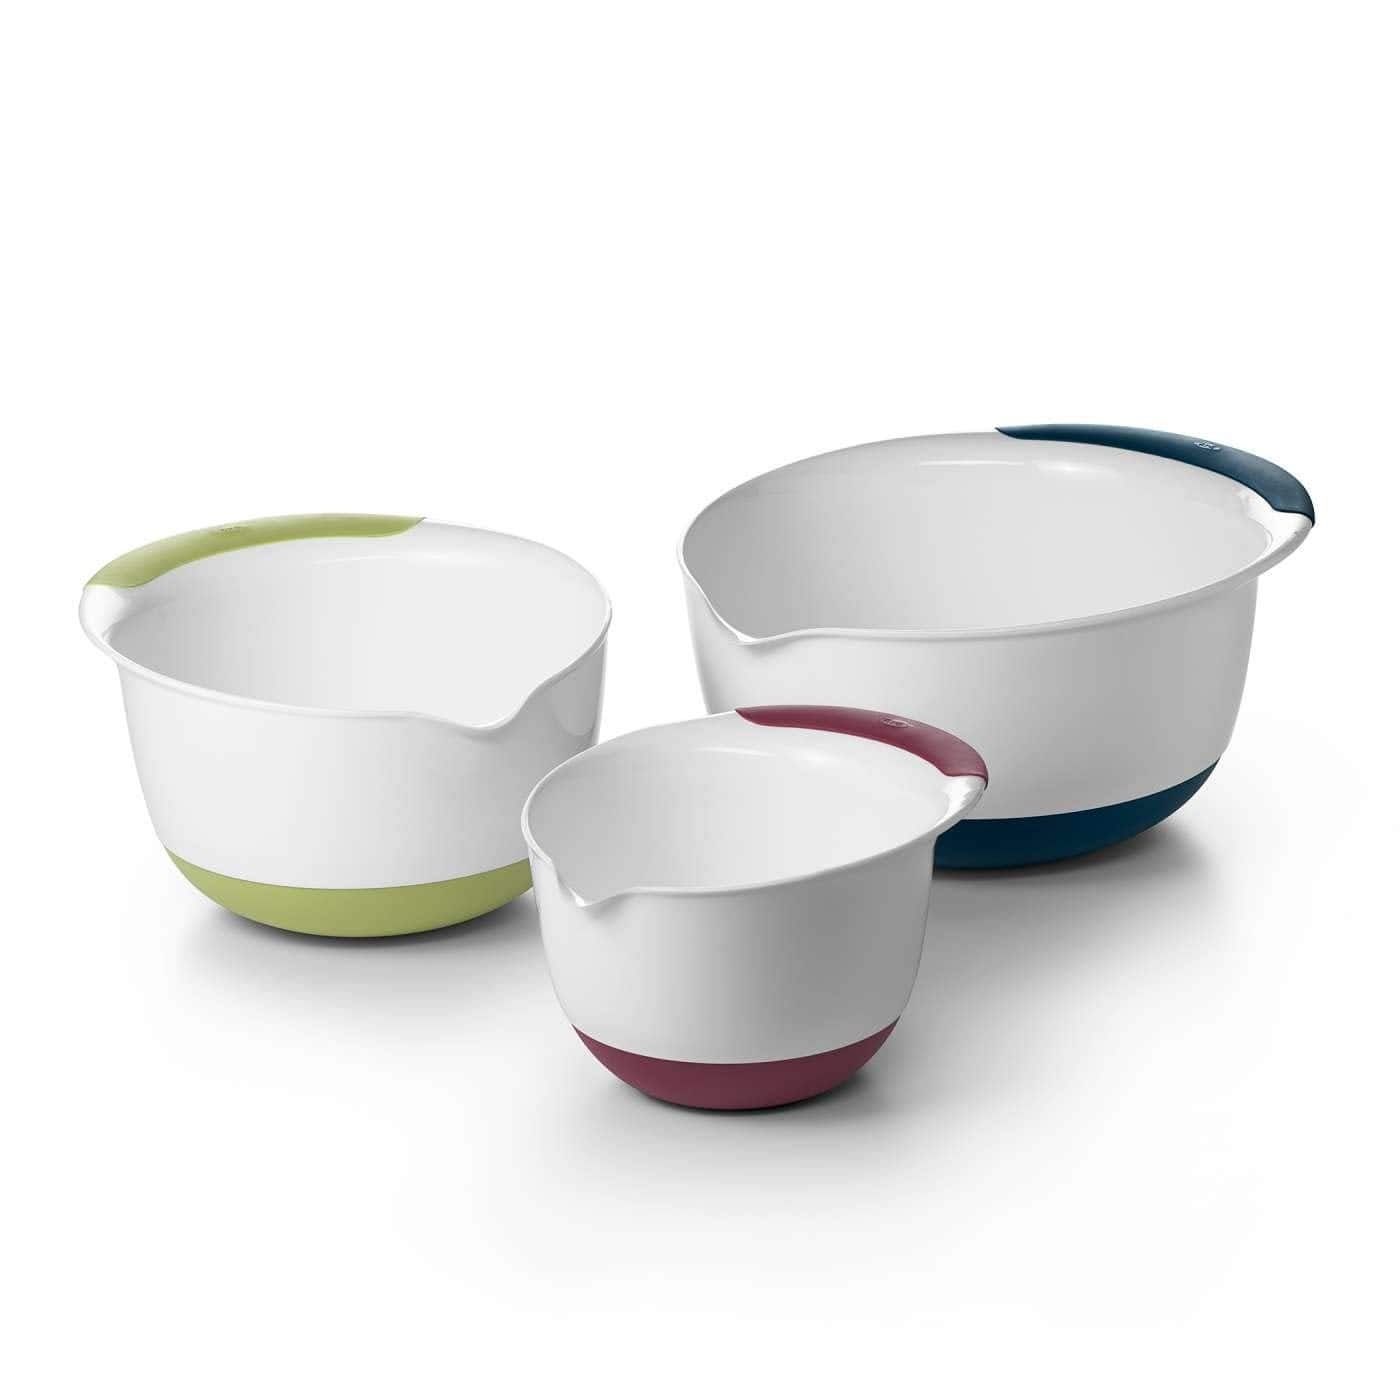 3-Piece OXO Good Grips Mixing Bowl Set